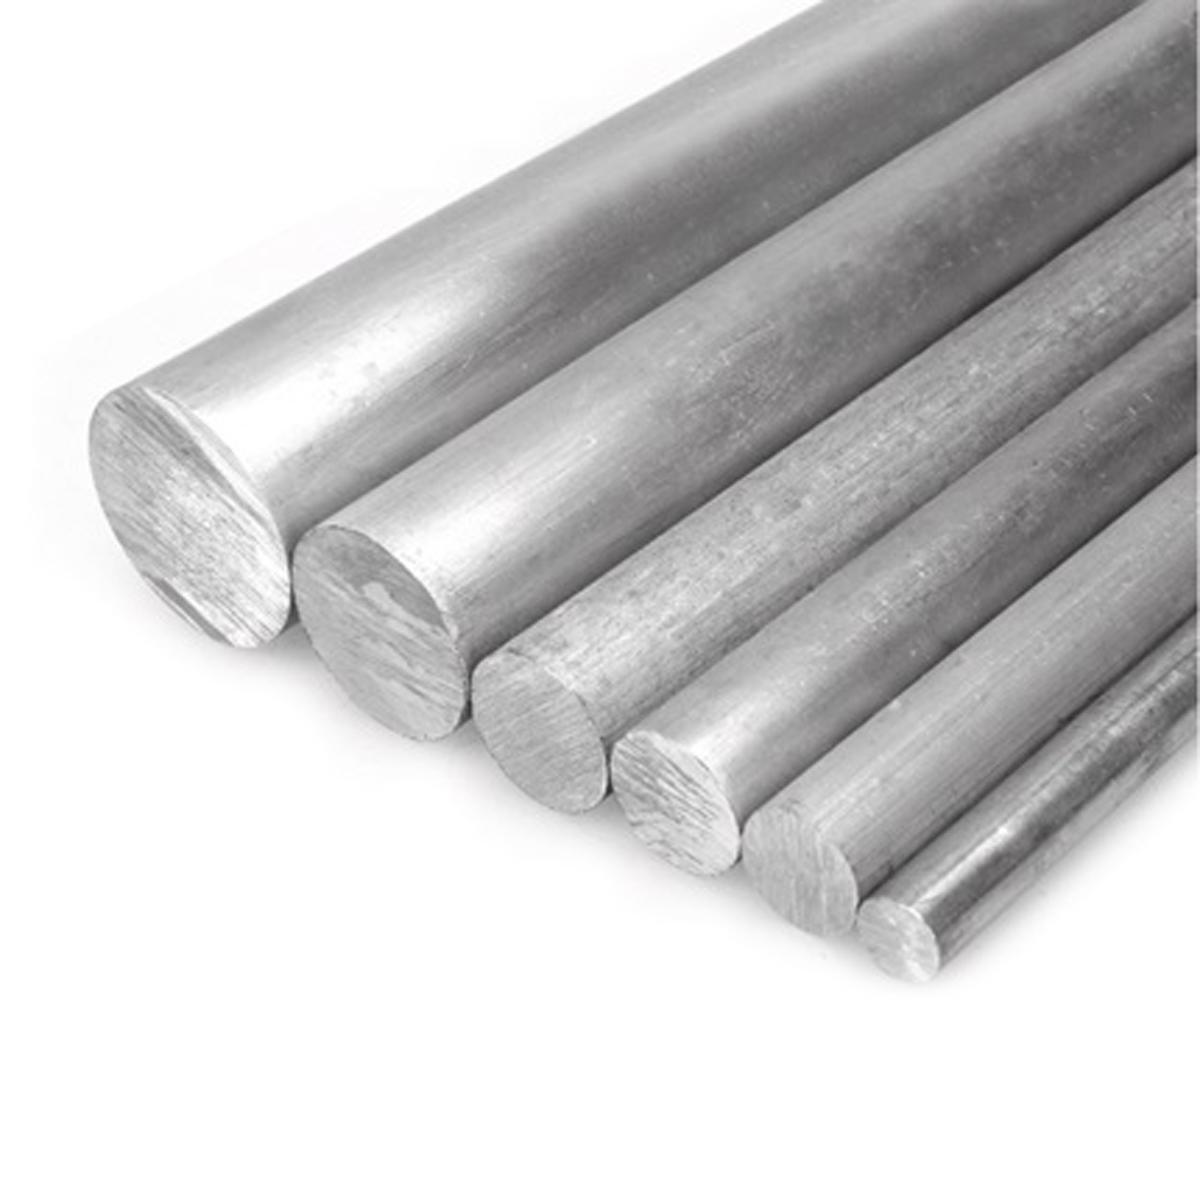 5pcs 10mm Dia x 250mm Long 0.3937'' x 9.84'' Aluminum 6061 Round Rod Bar by Yodaoke